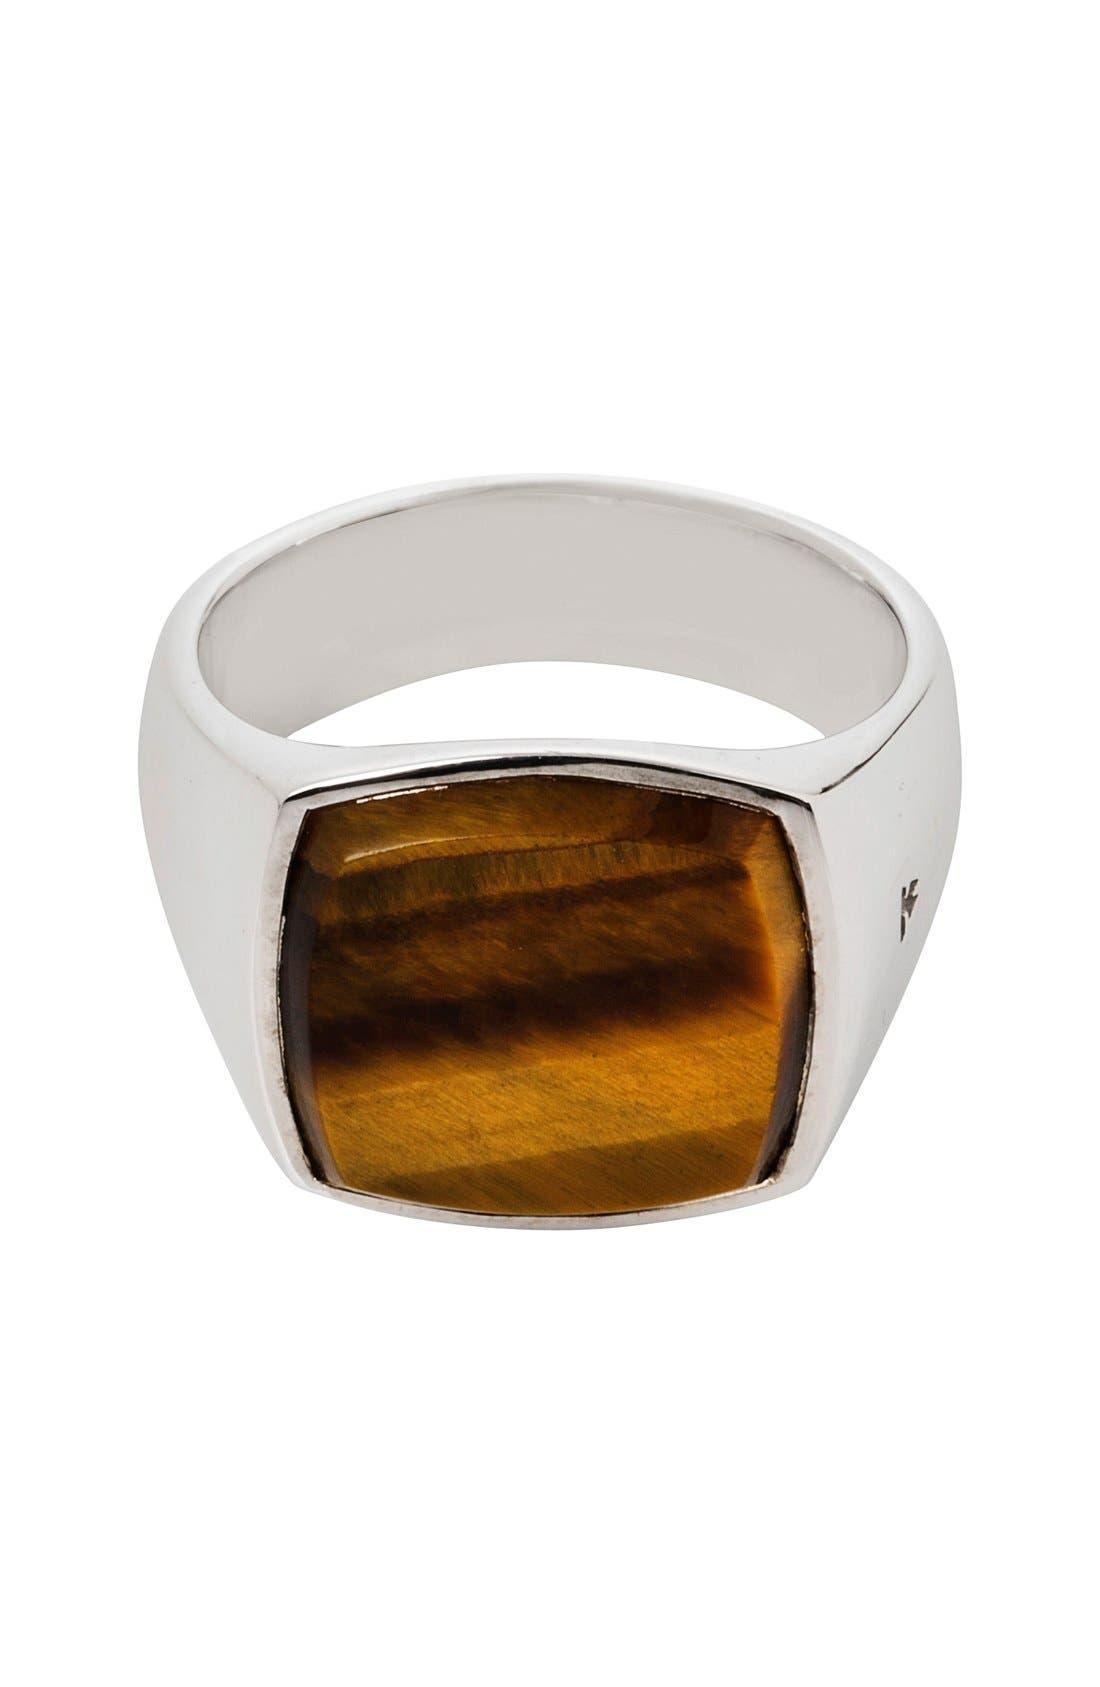 Alternate Image 1 Selected - Tom Wood Cushion Tiger's Eye Signet Ring